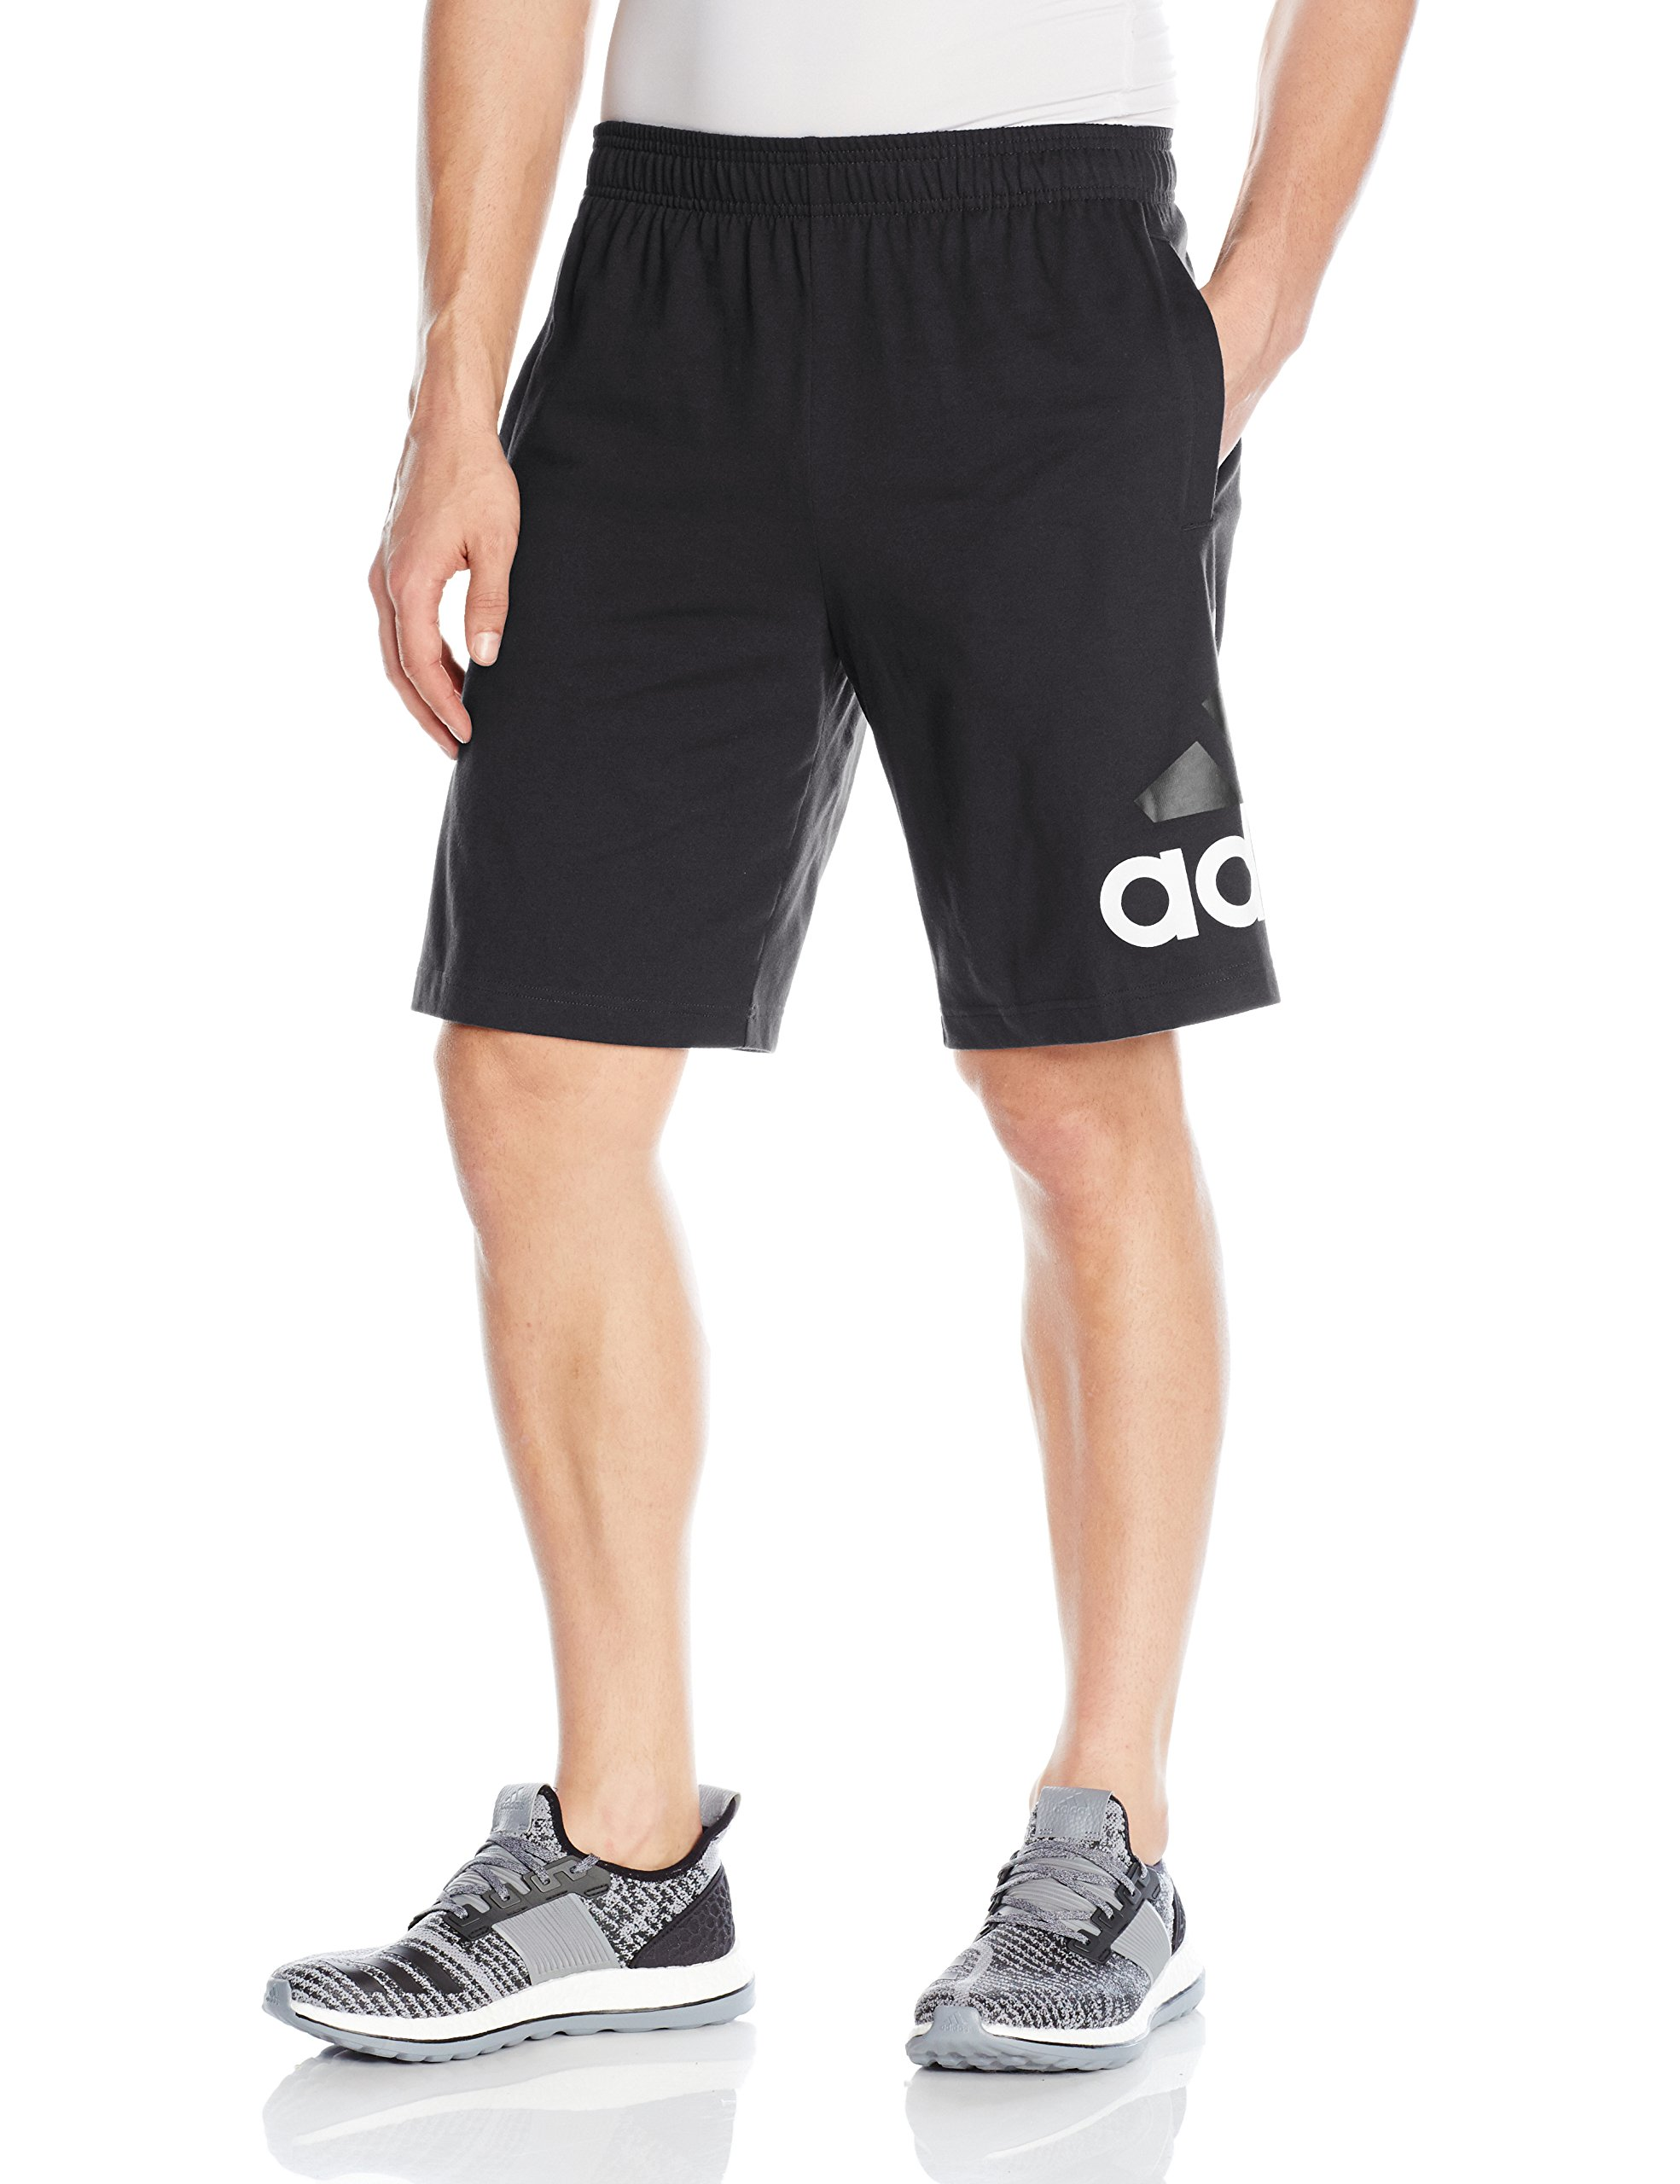 adidas Men's Athletics Jersey Shorts, Black, 3X-Large